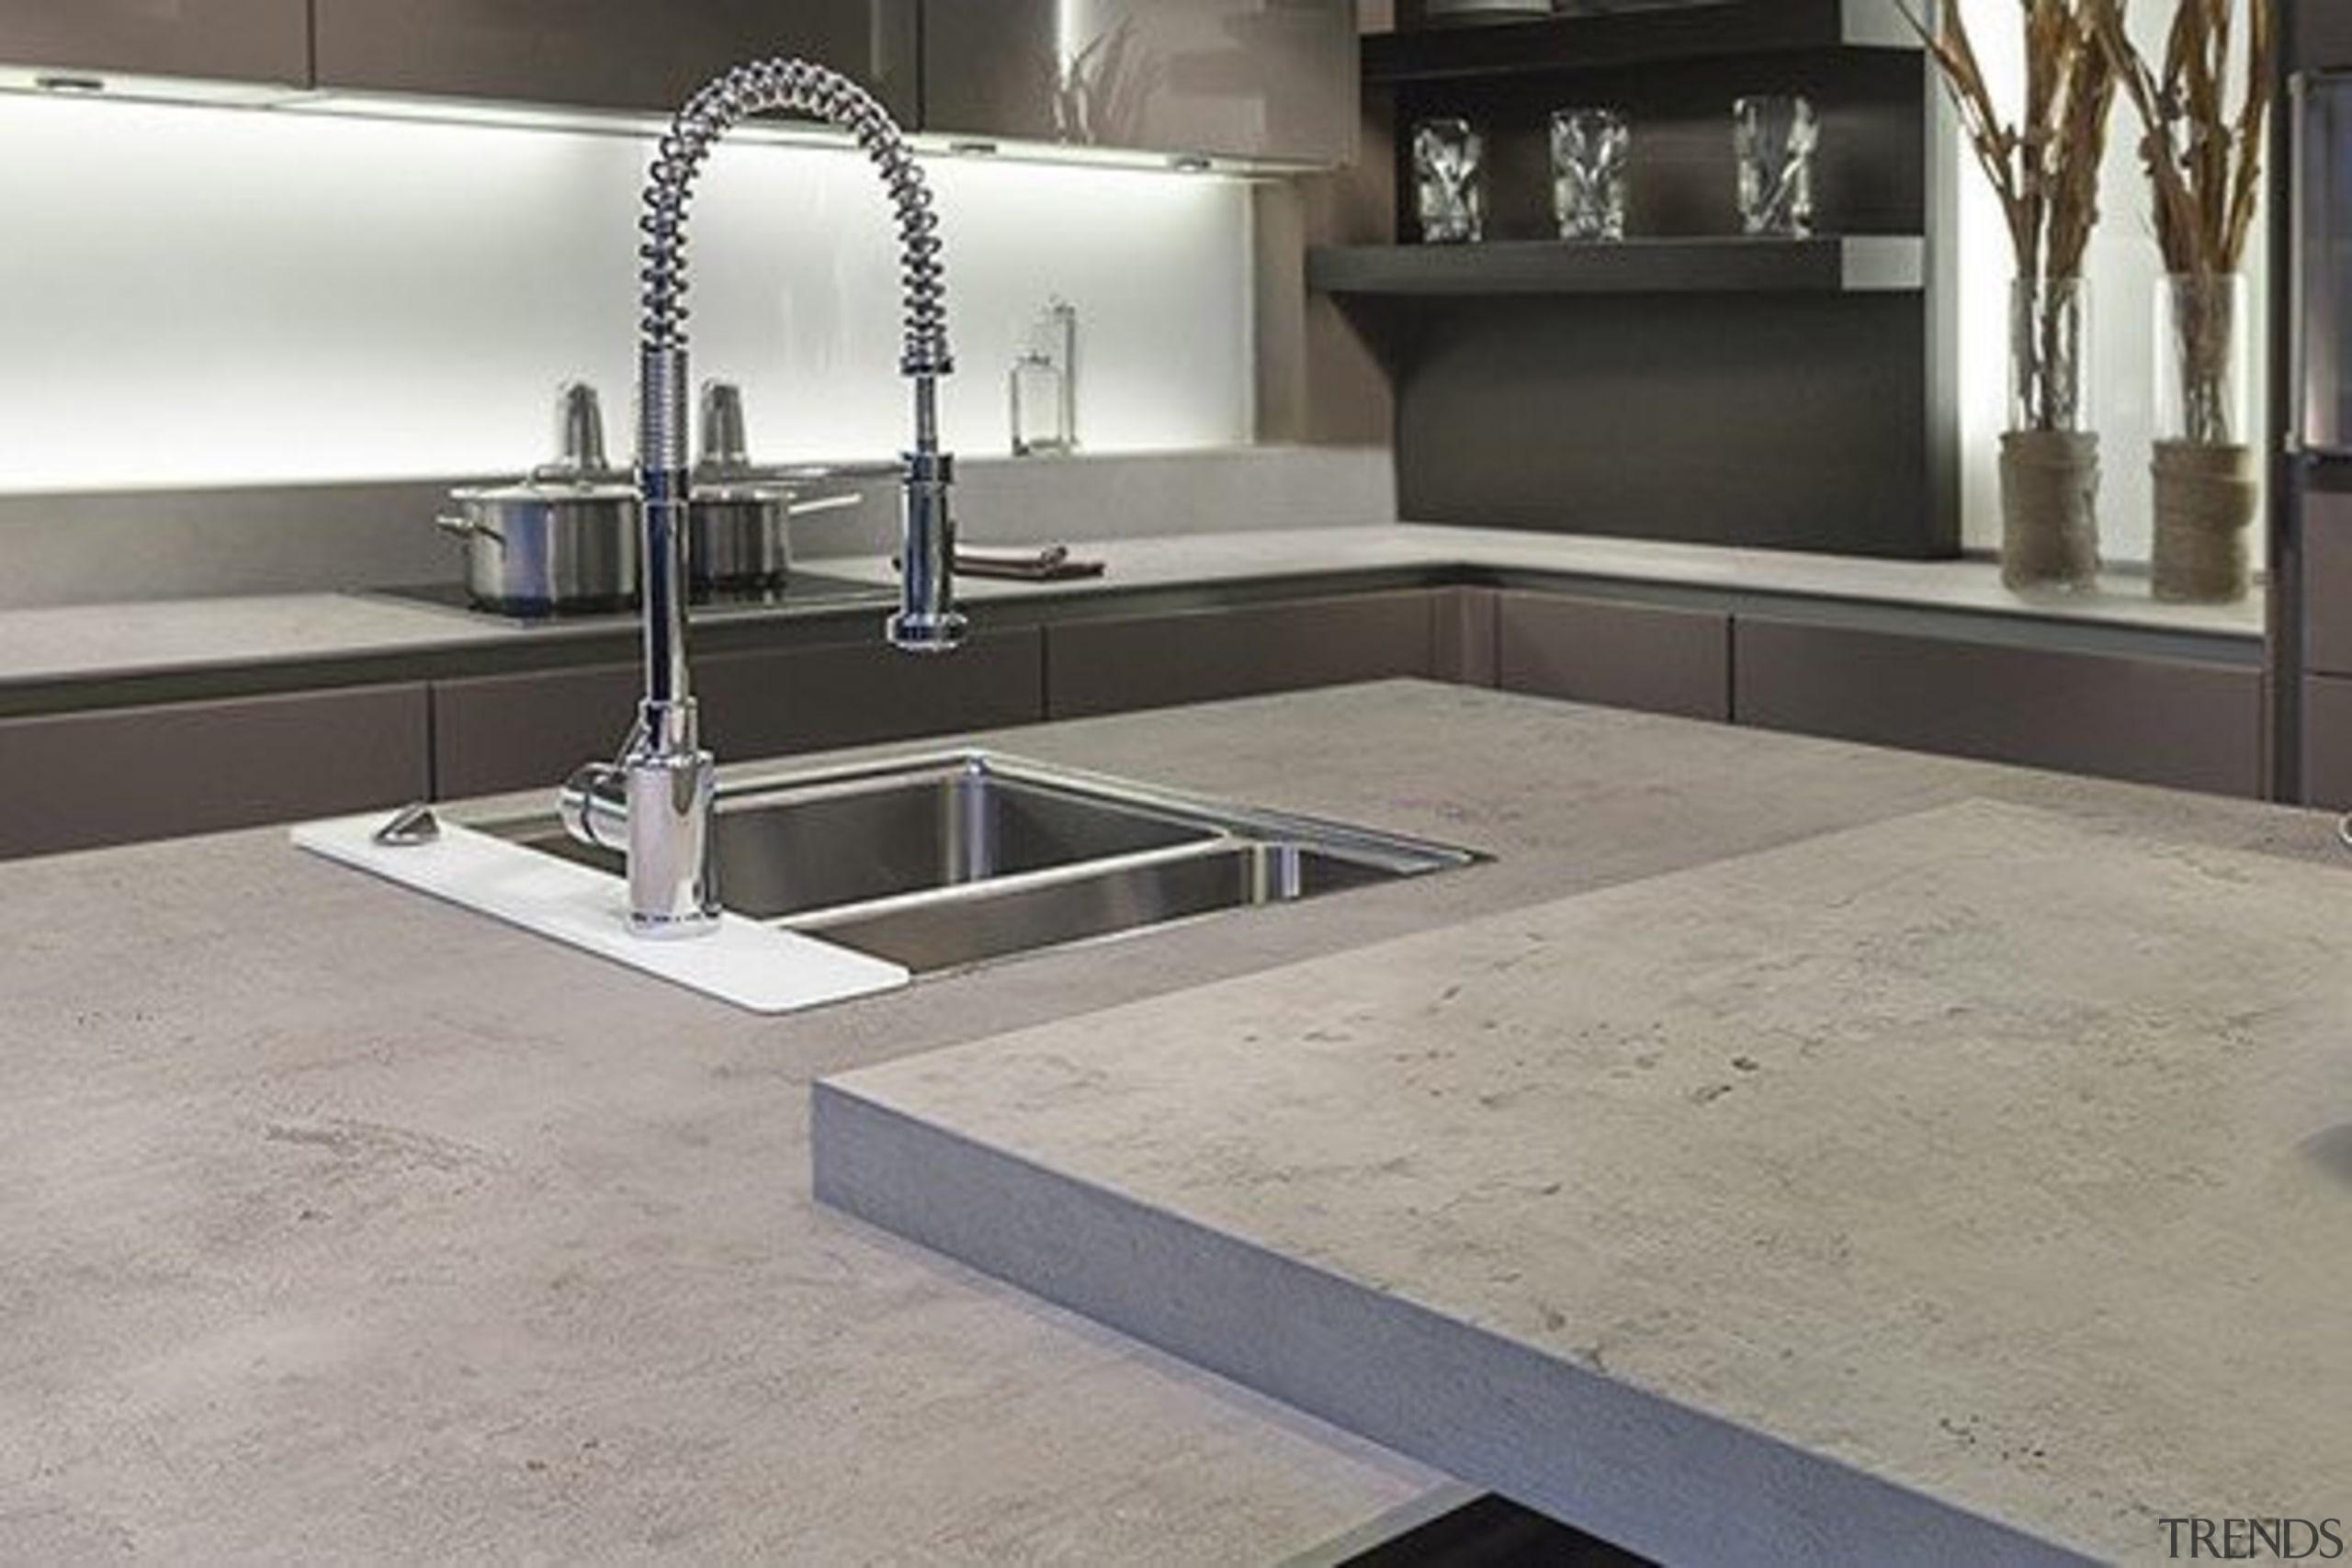 Neolith Beton - Neolith Beton - countertop | countertop, floor, flooring, sink, tile, gray